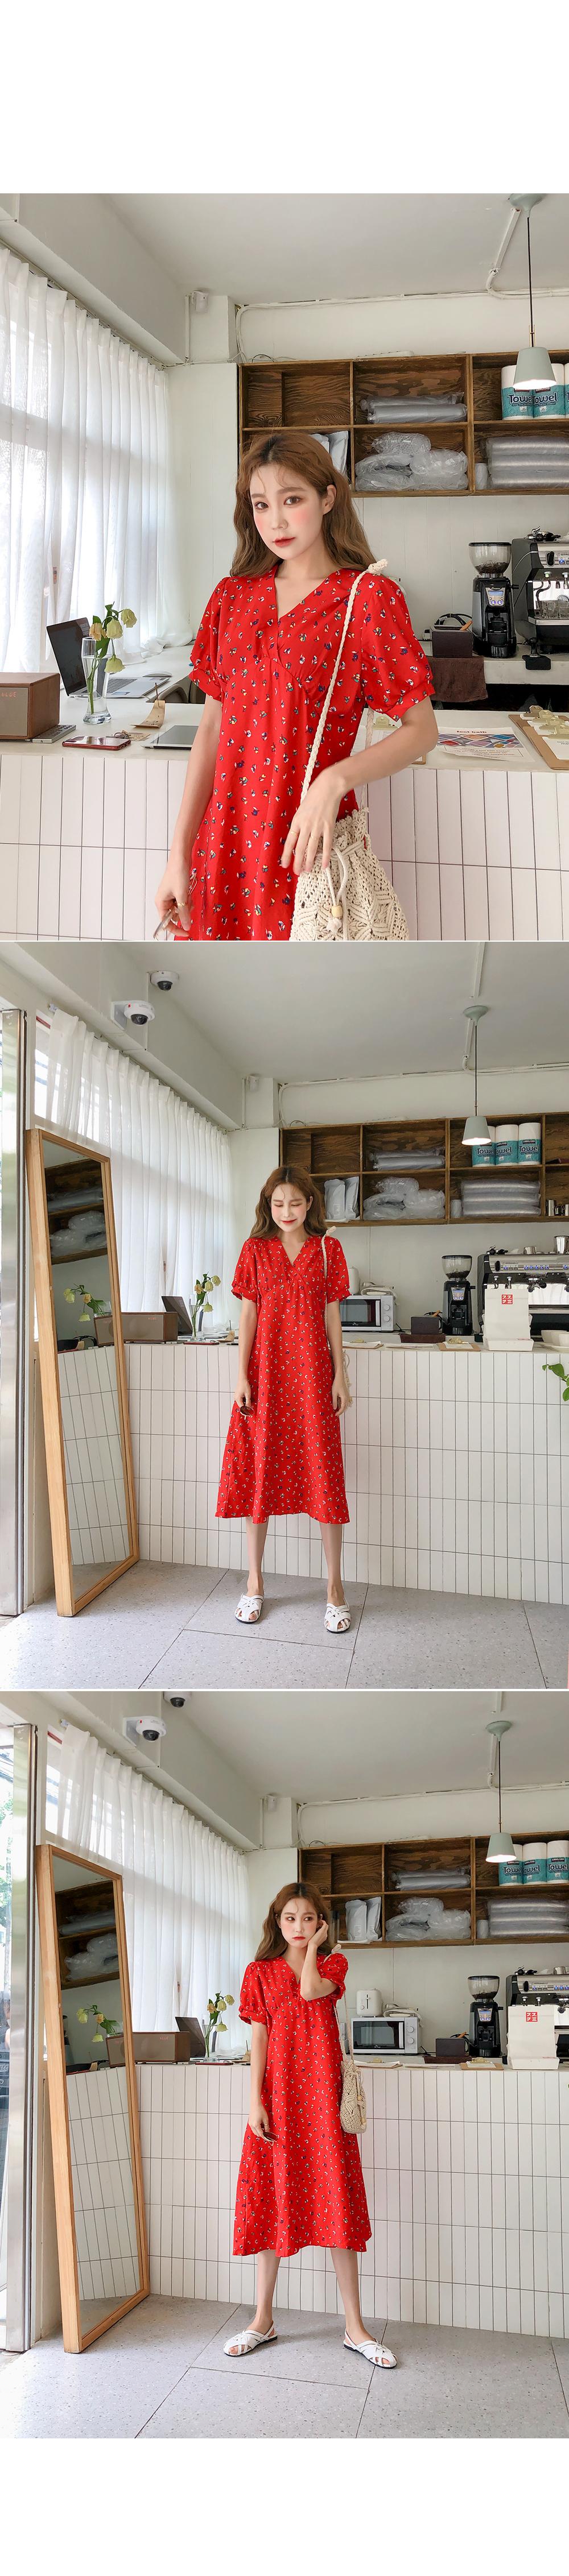 Intense Red Dress